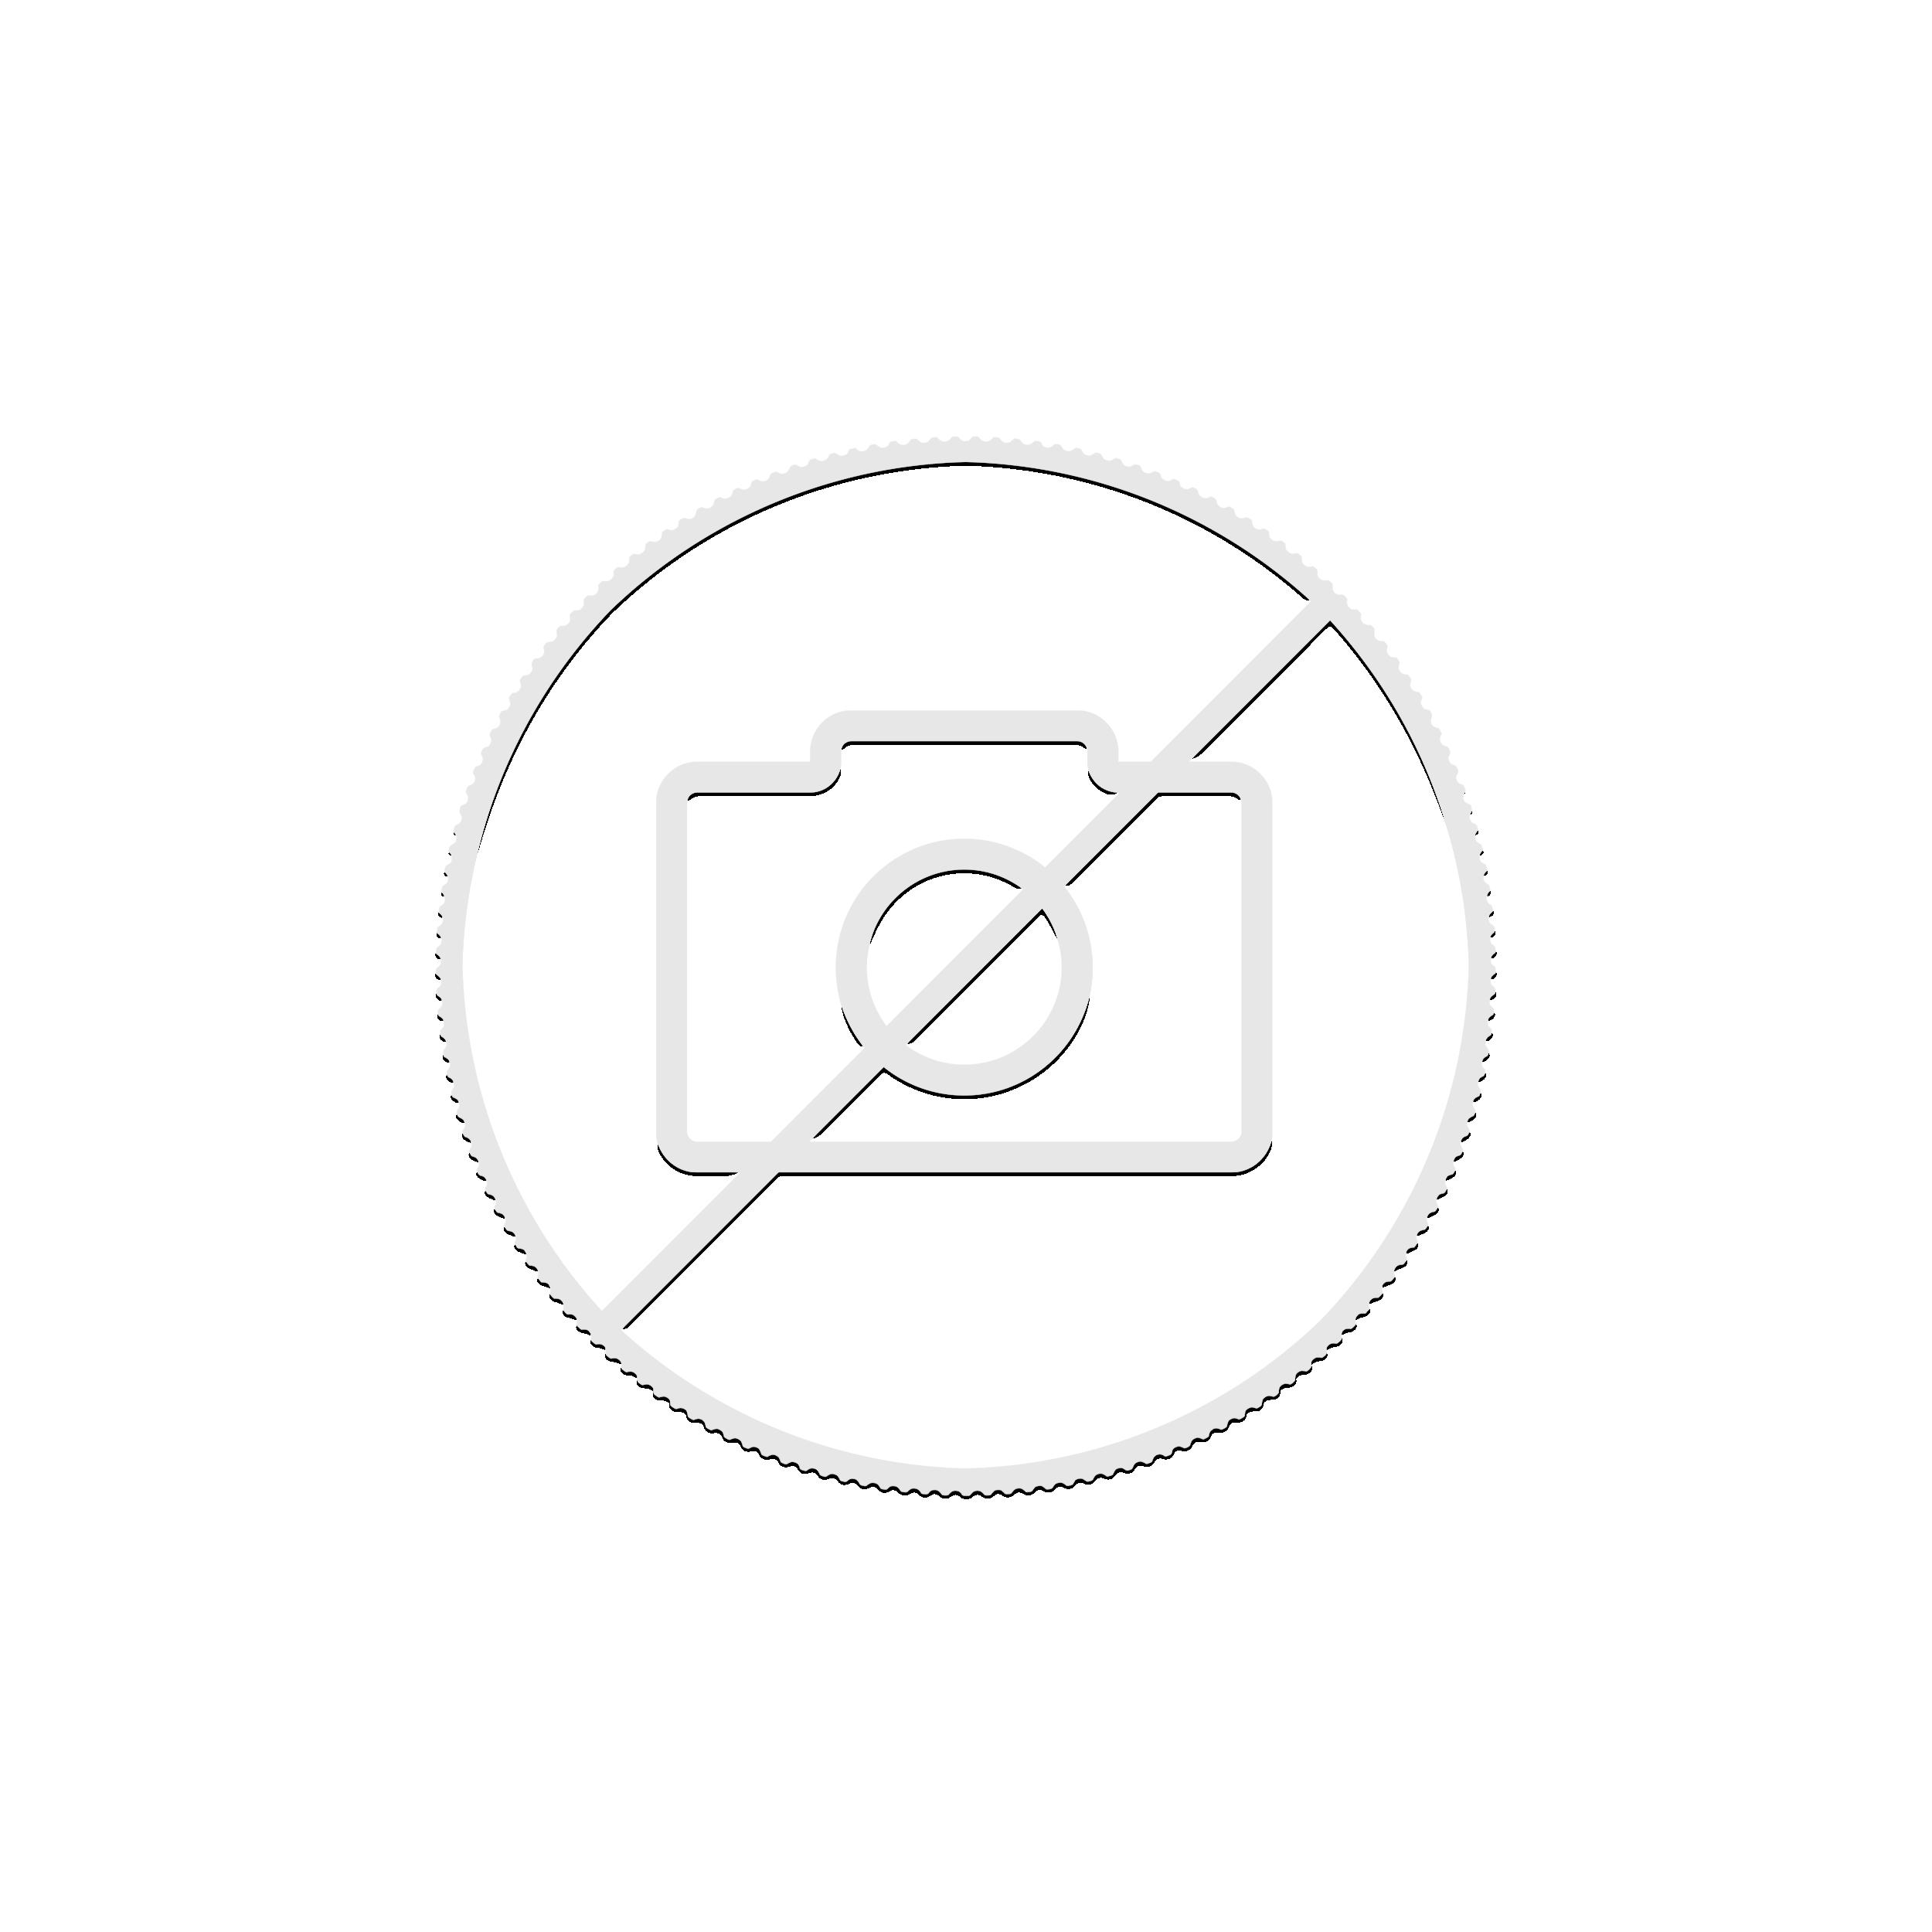 1 Troy ounce gold coin Britannia 2020